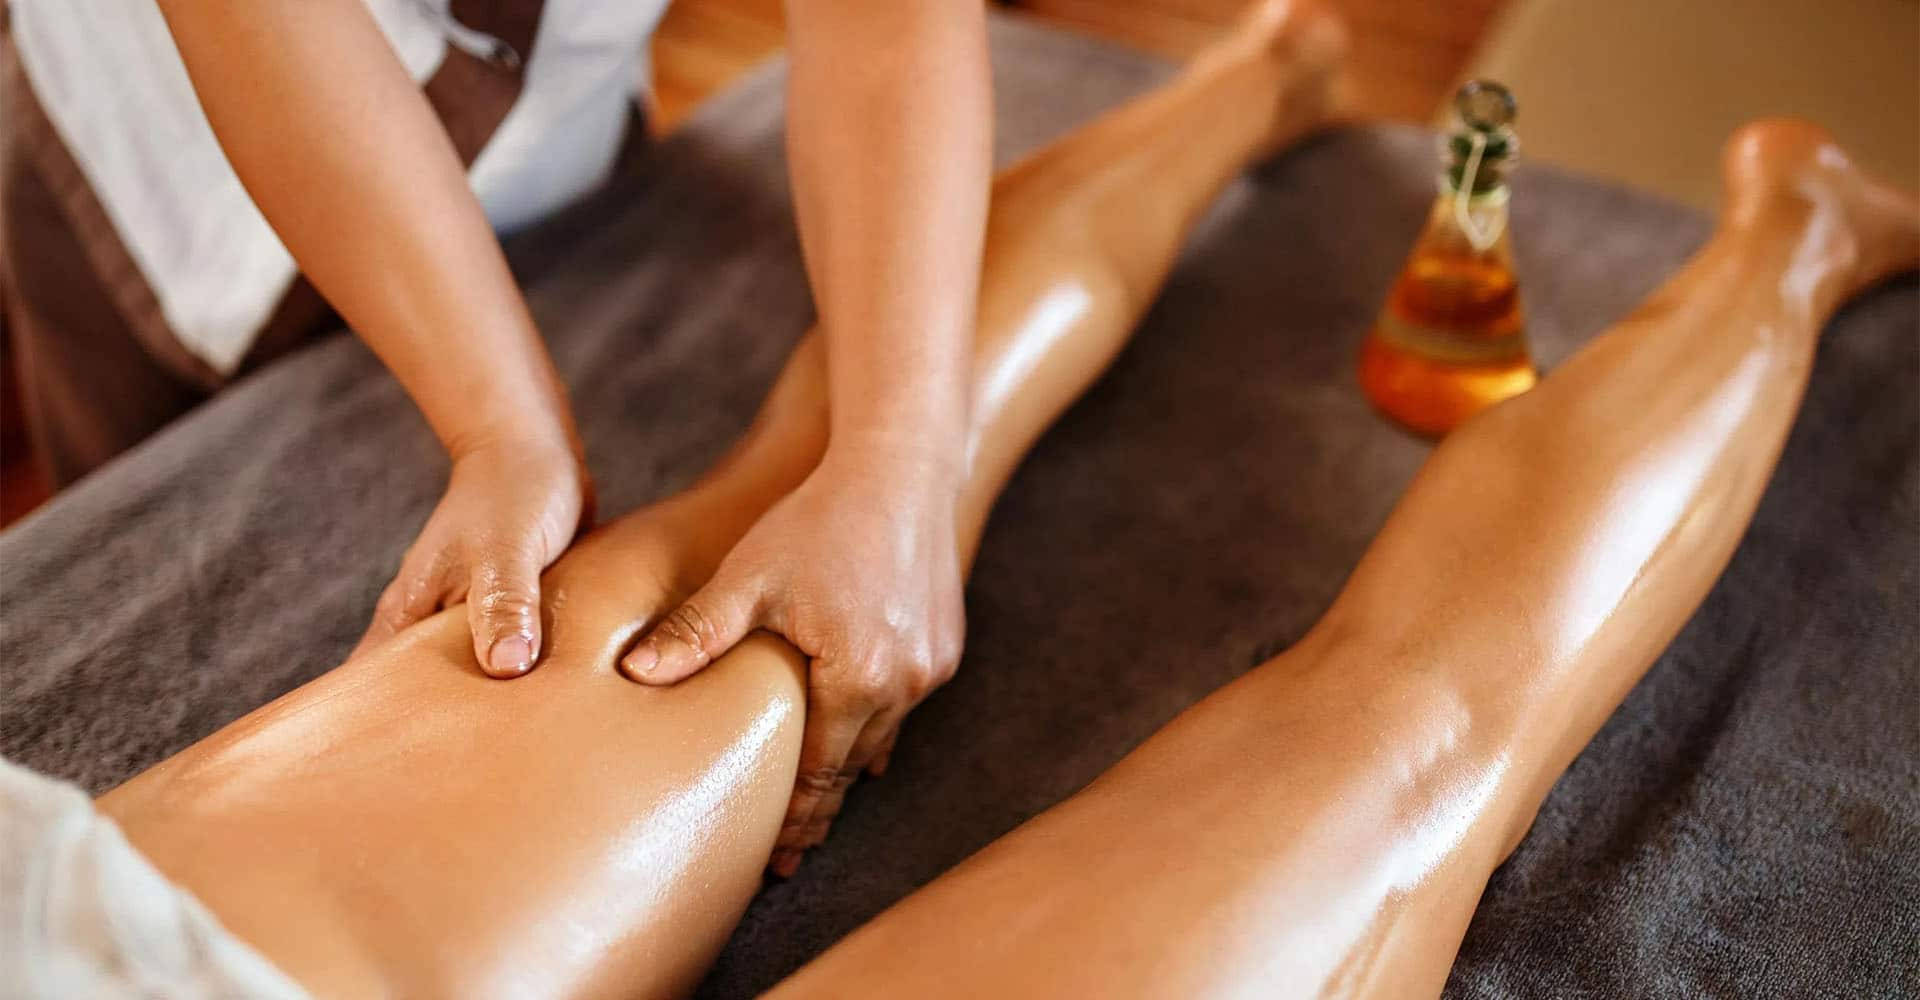 Frau bekommt Ayurveda Massage Abhyanga mit Öl